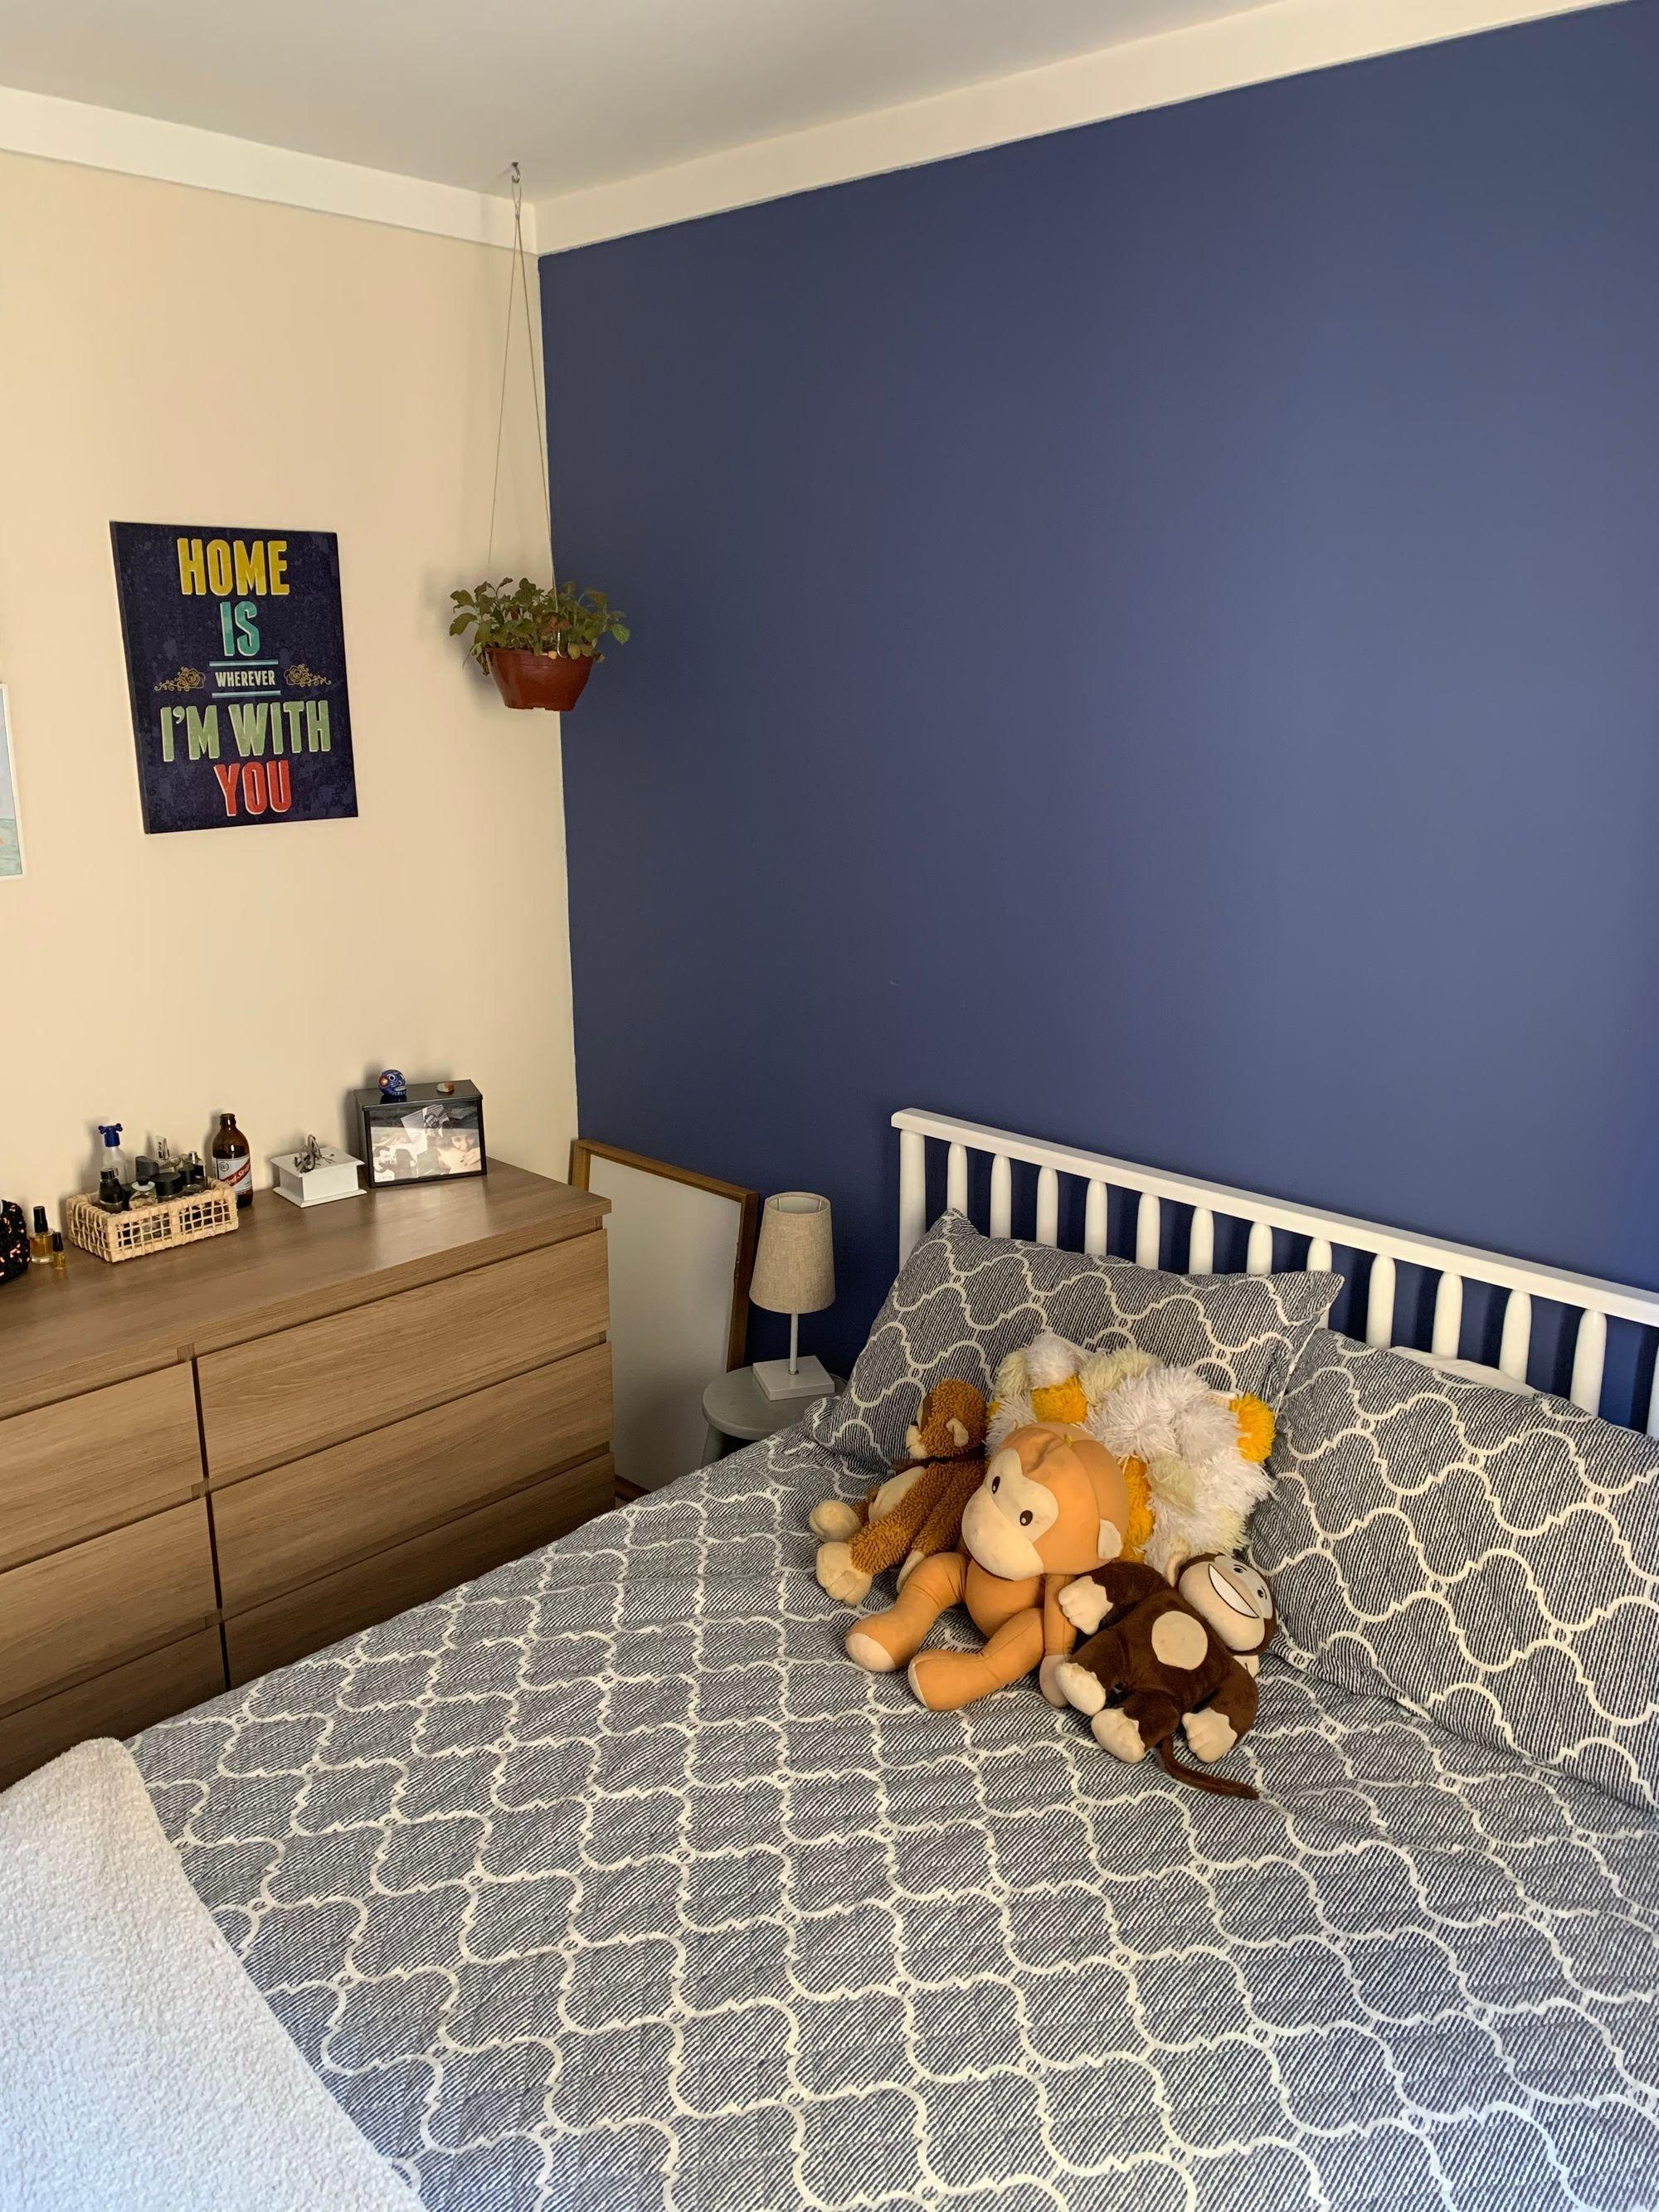 Foto de Quarto com cama, vaso de planta, urso teddy